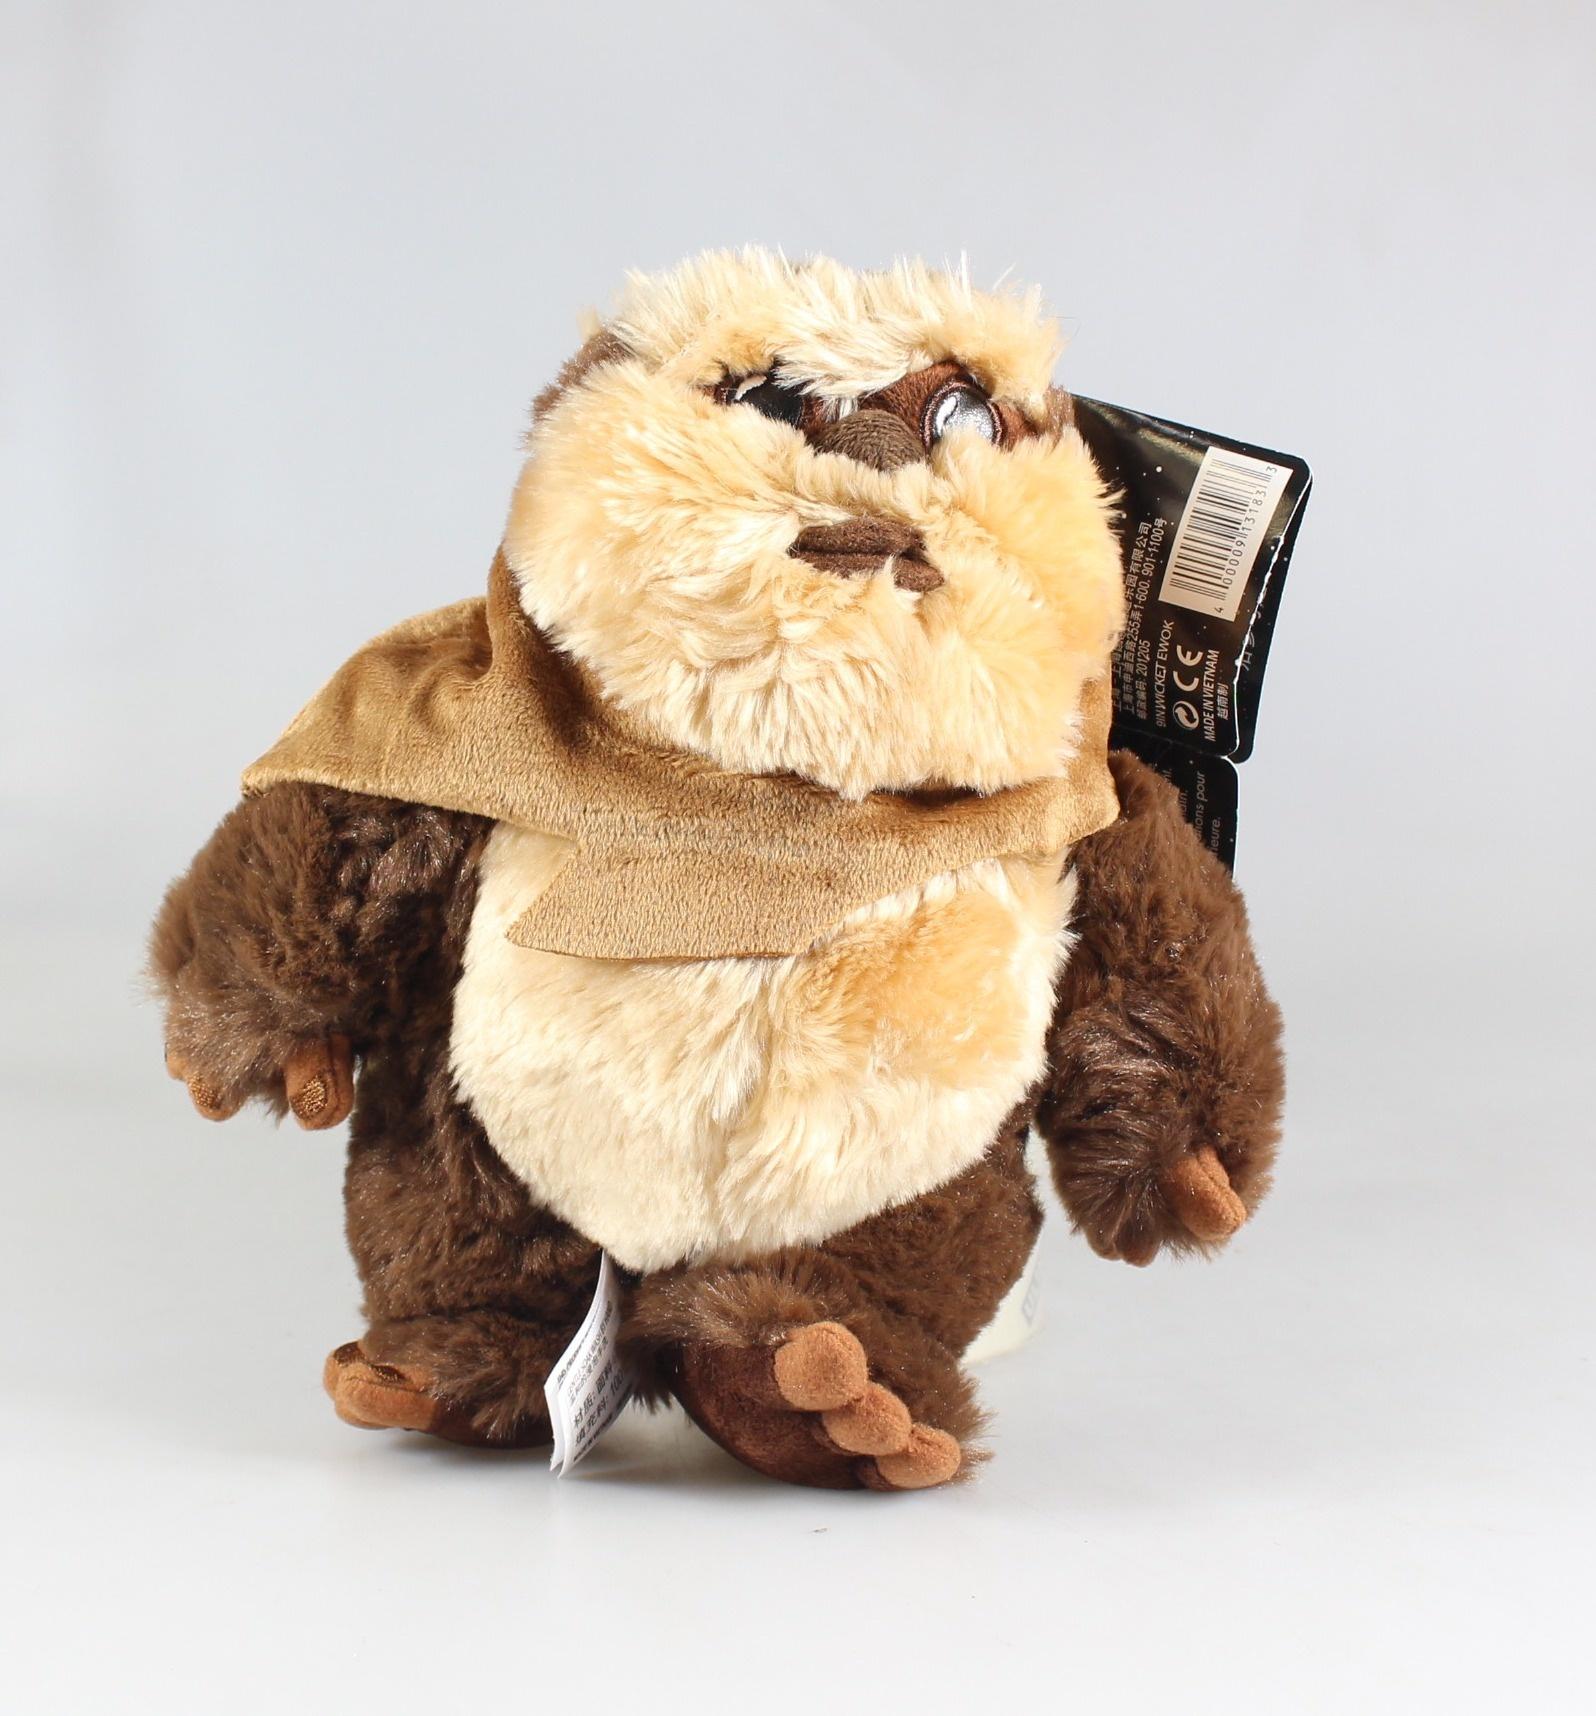 Plush Ewok Toys Buy Online From Fishpond Com Au